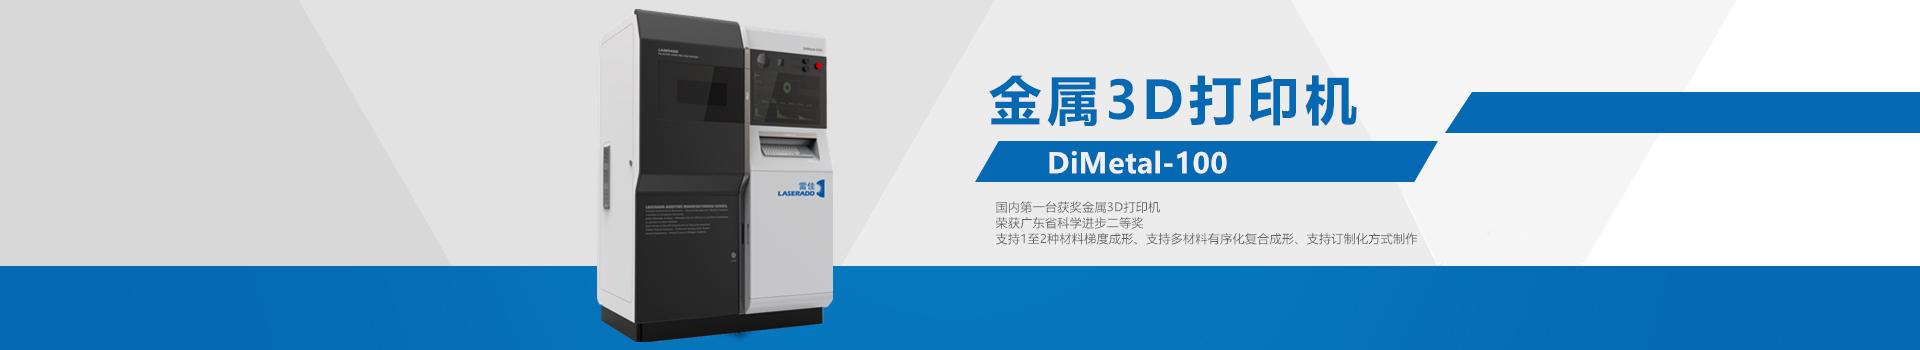 DiMetal-100  多材料金属3D打印机